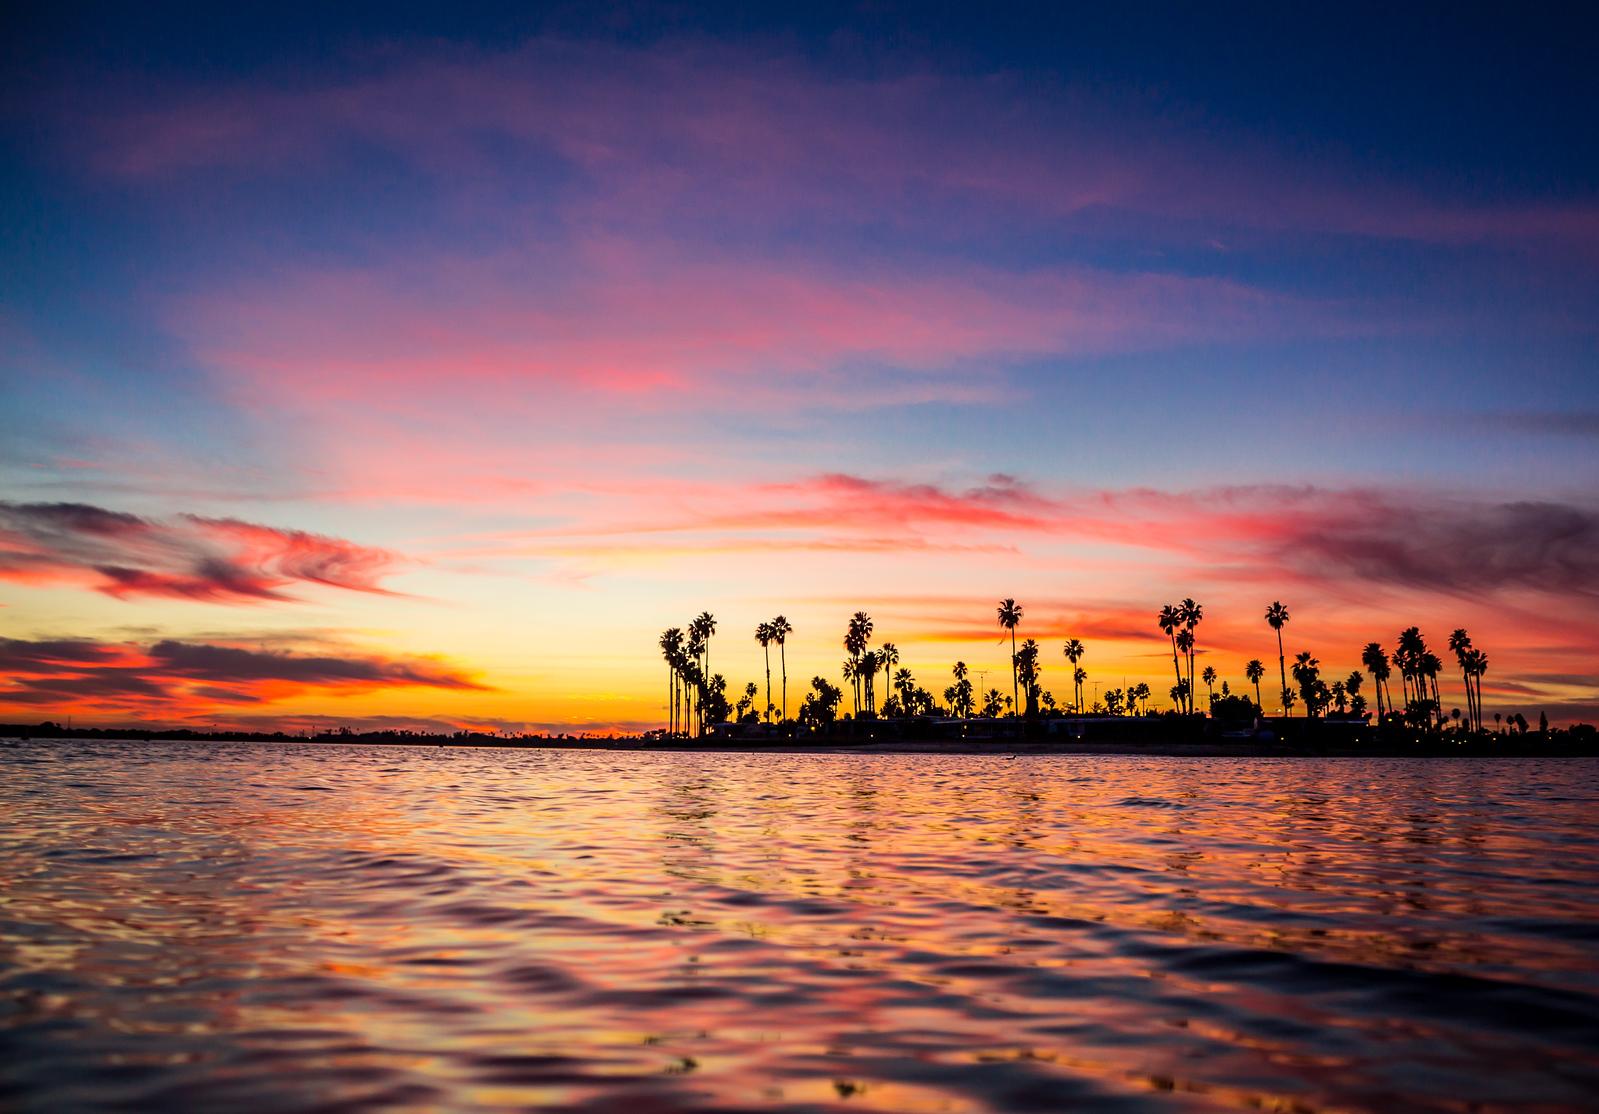 Mission Bay Sunset